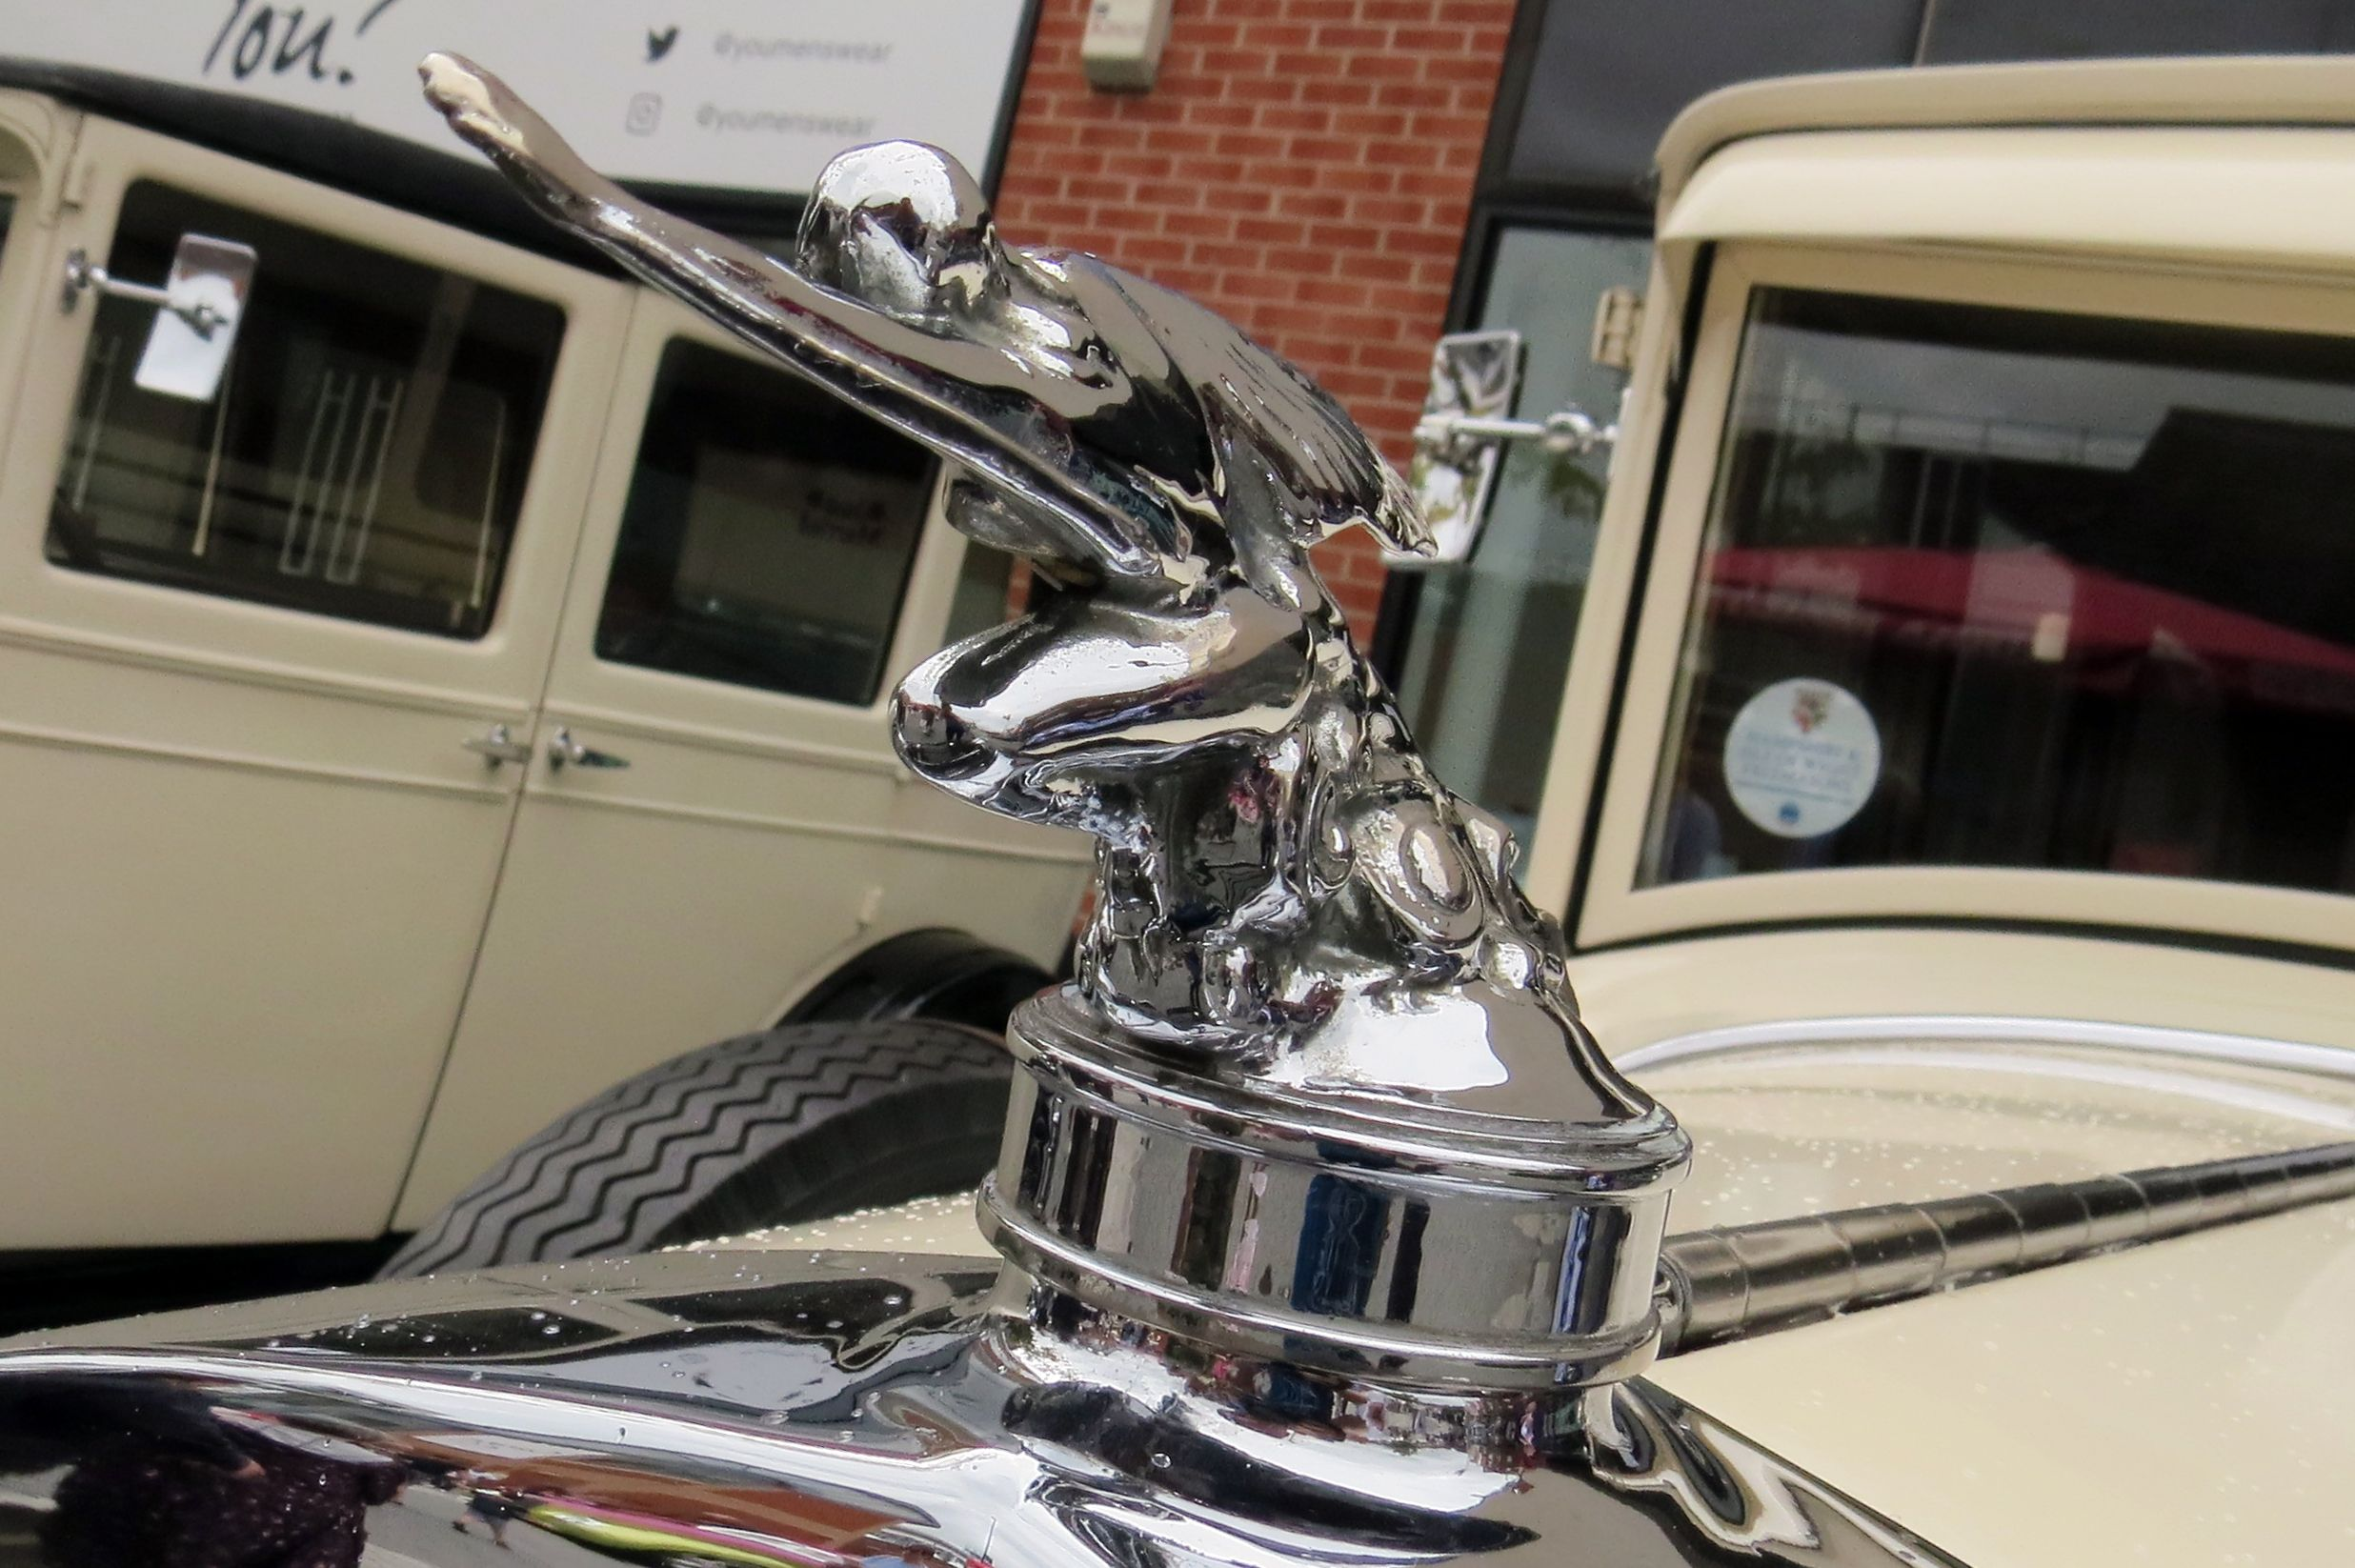 Pin By Marcin Gradowski On Car Show Camberley England - Car show england